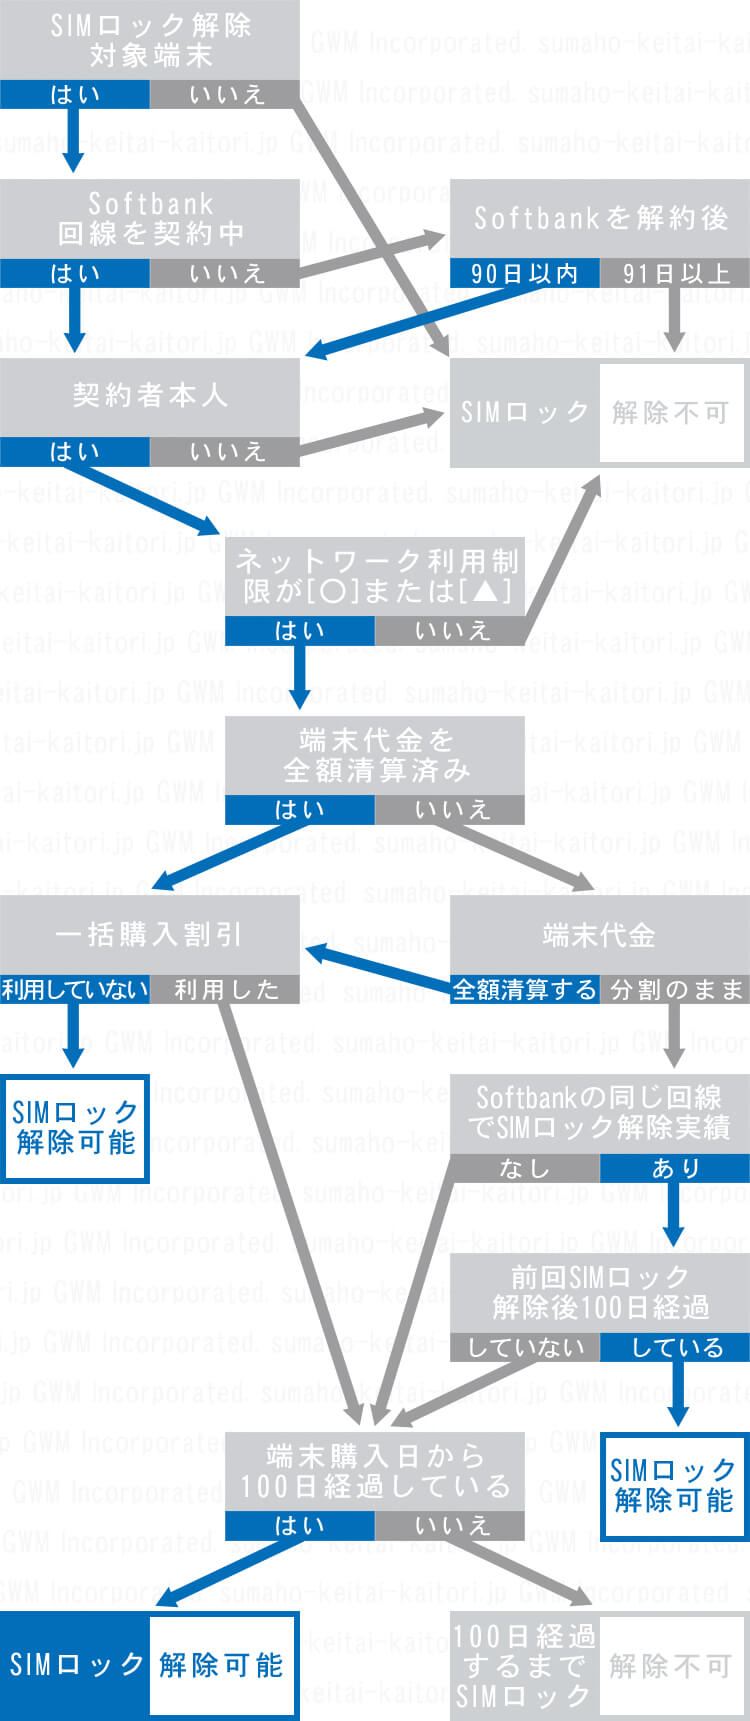 Softbank 端末 SIM ロック解除条件のフローチャート